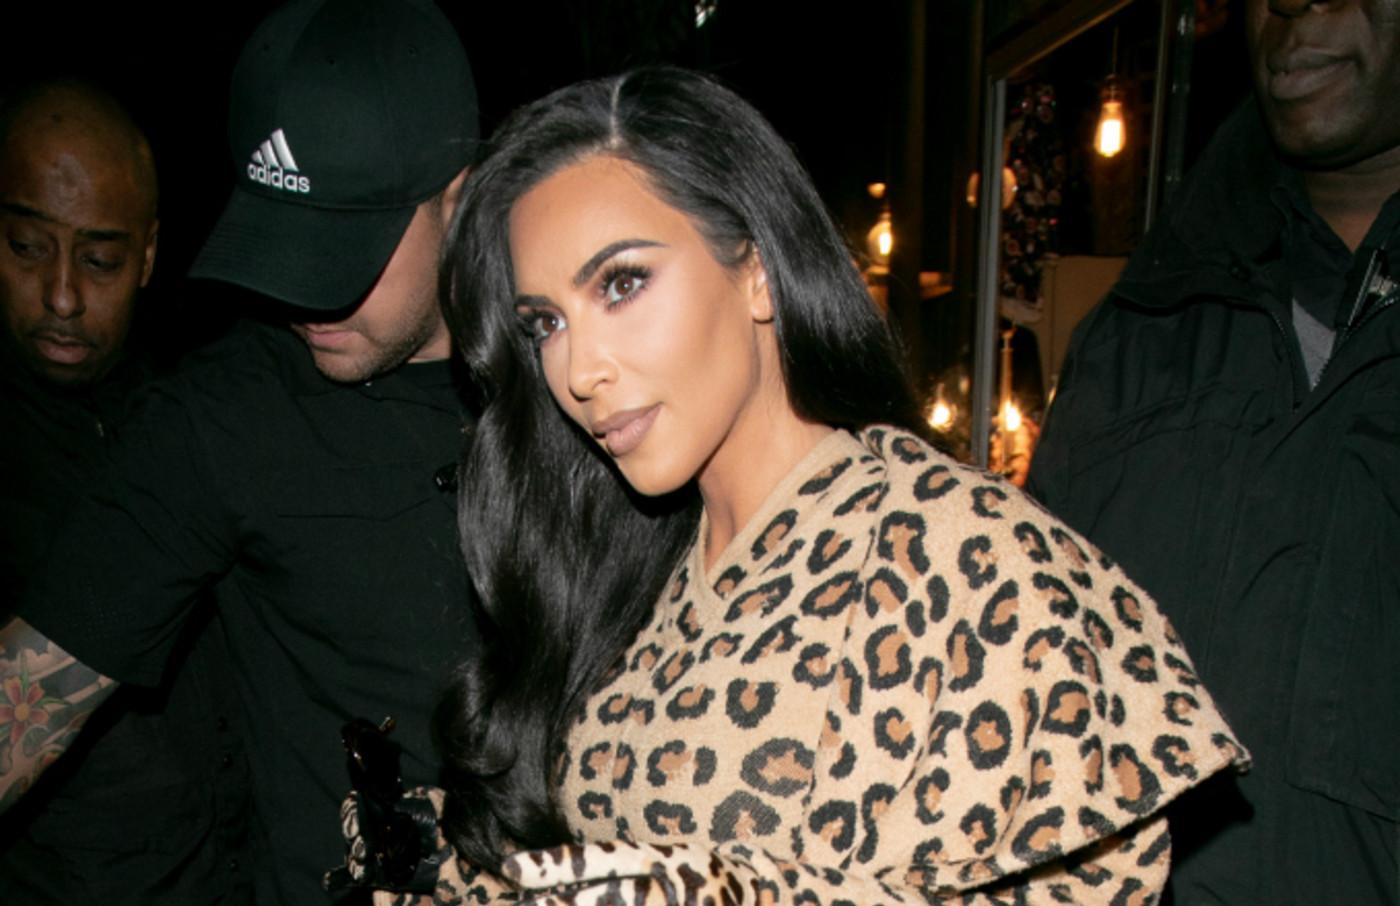 Kim Kardashian is seen on March 05, 2019 in Paris, France